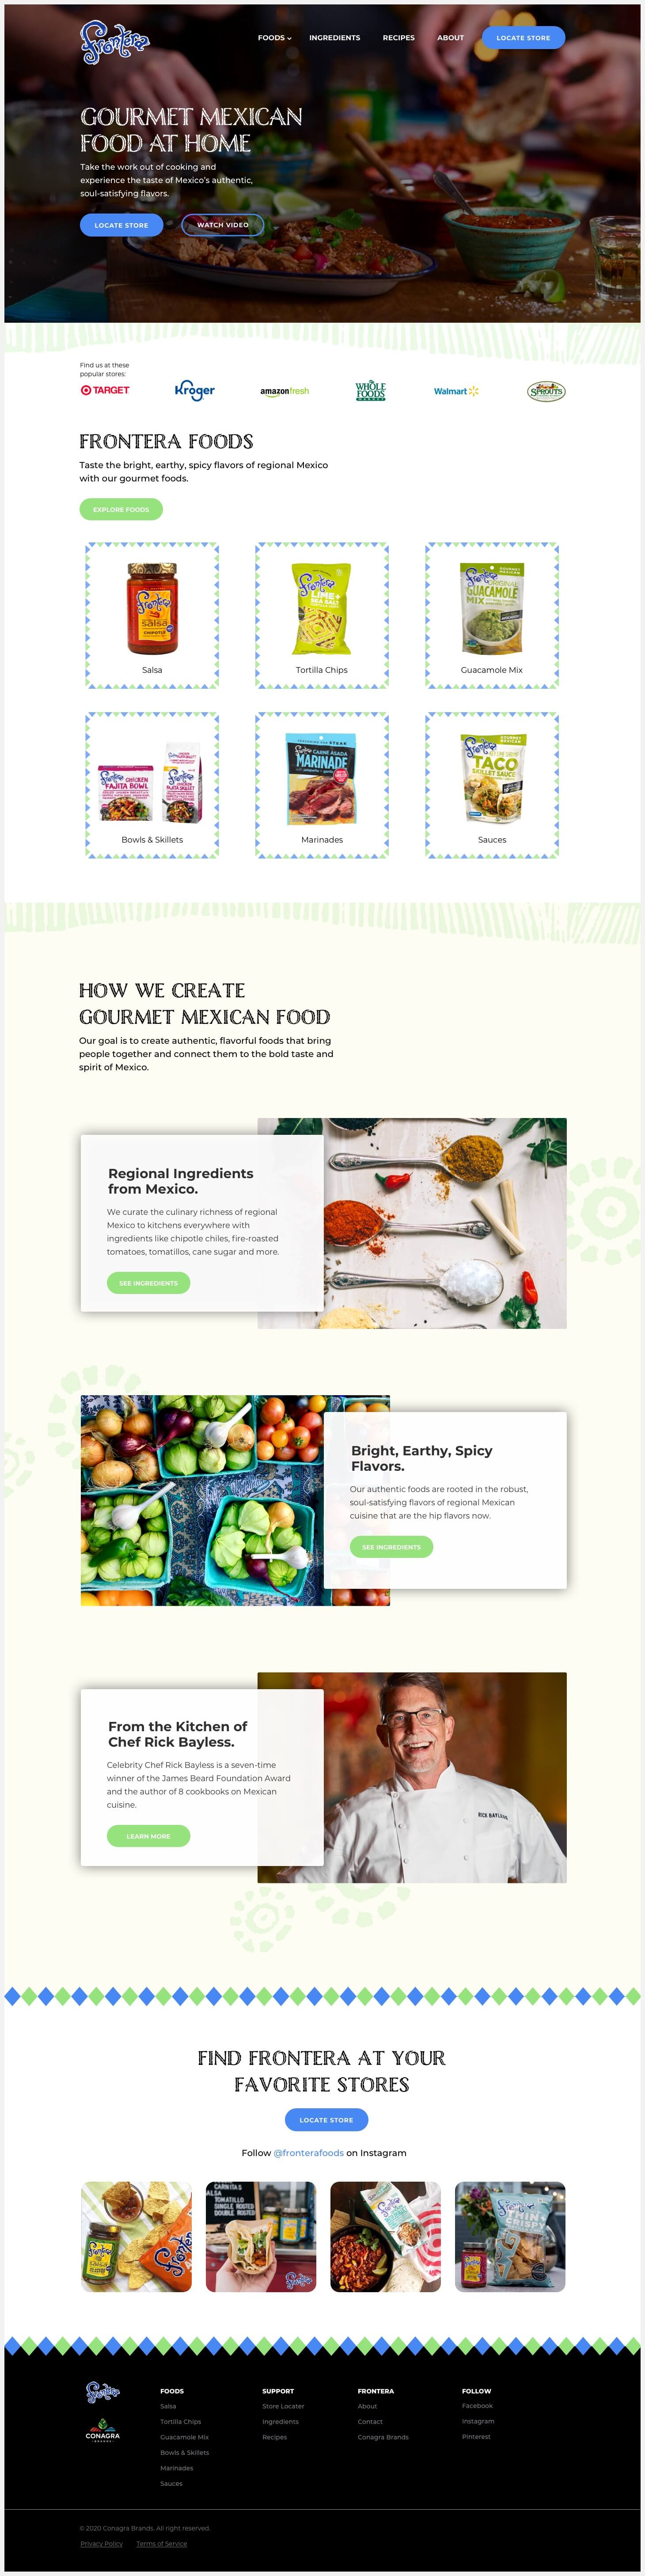 Fontera's redesigned website.